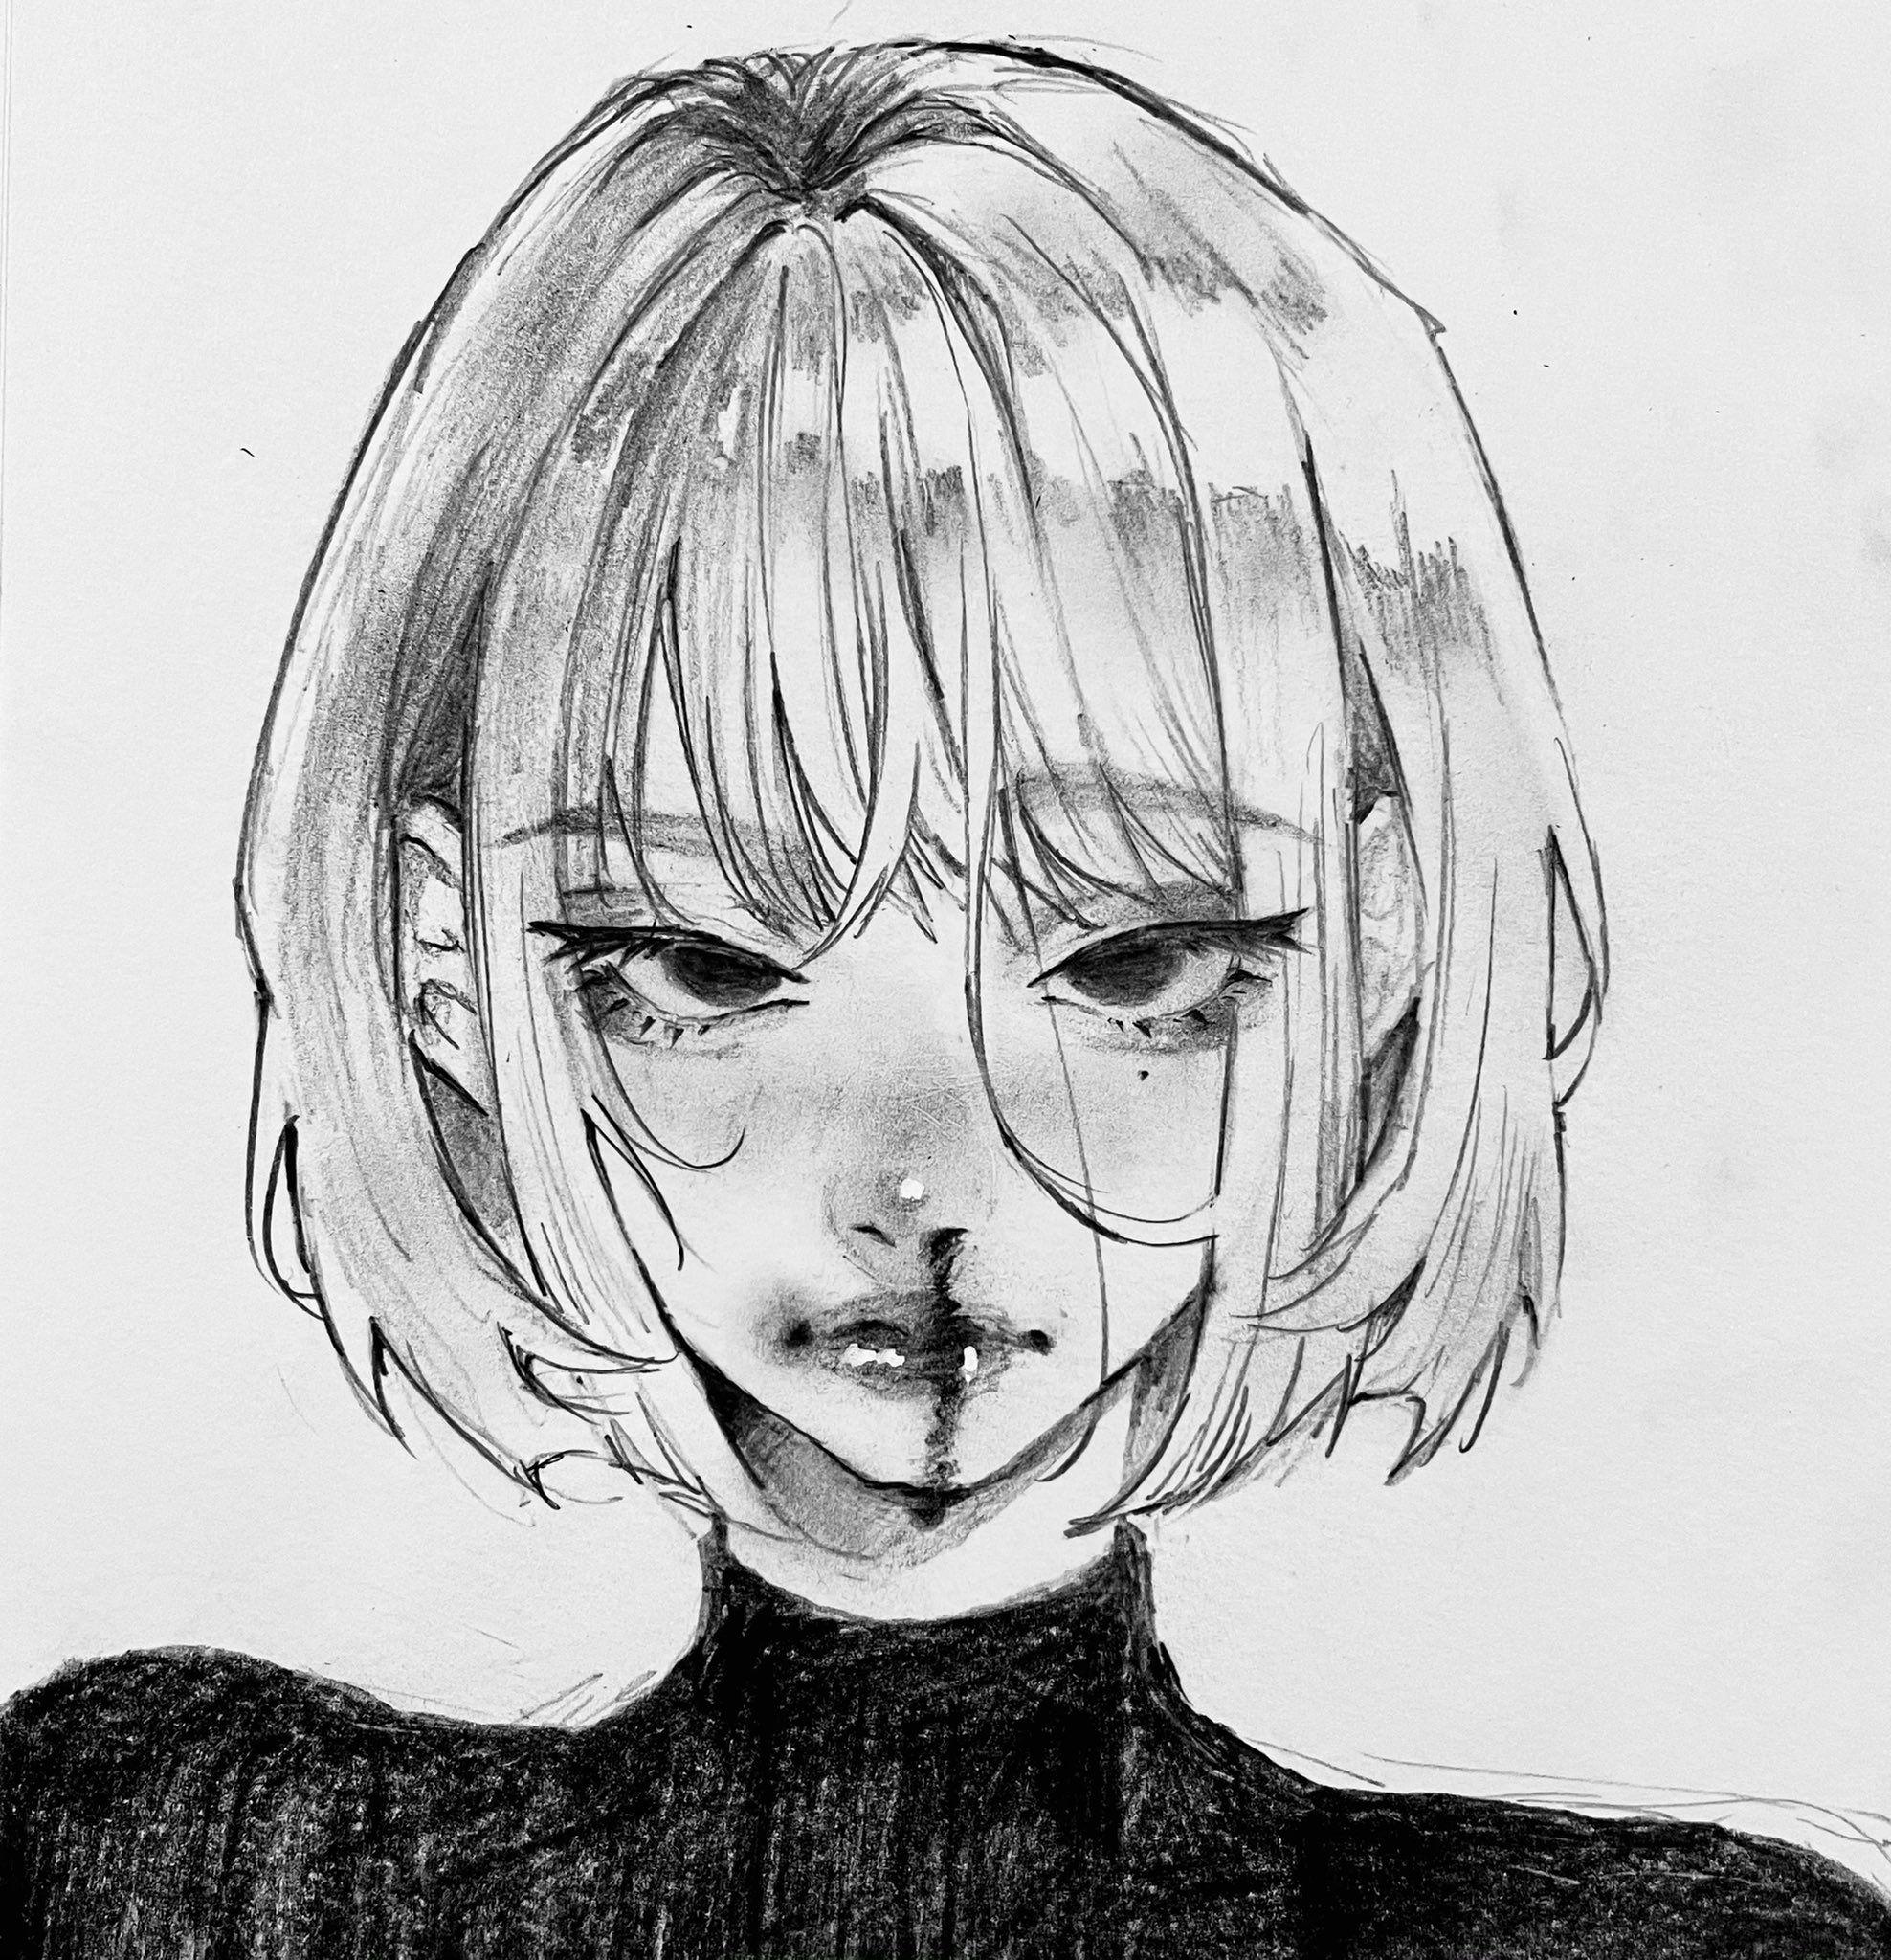 Photo of 田森(メルカリでイラスト販売中) on Twitter